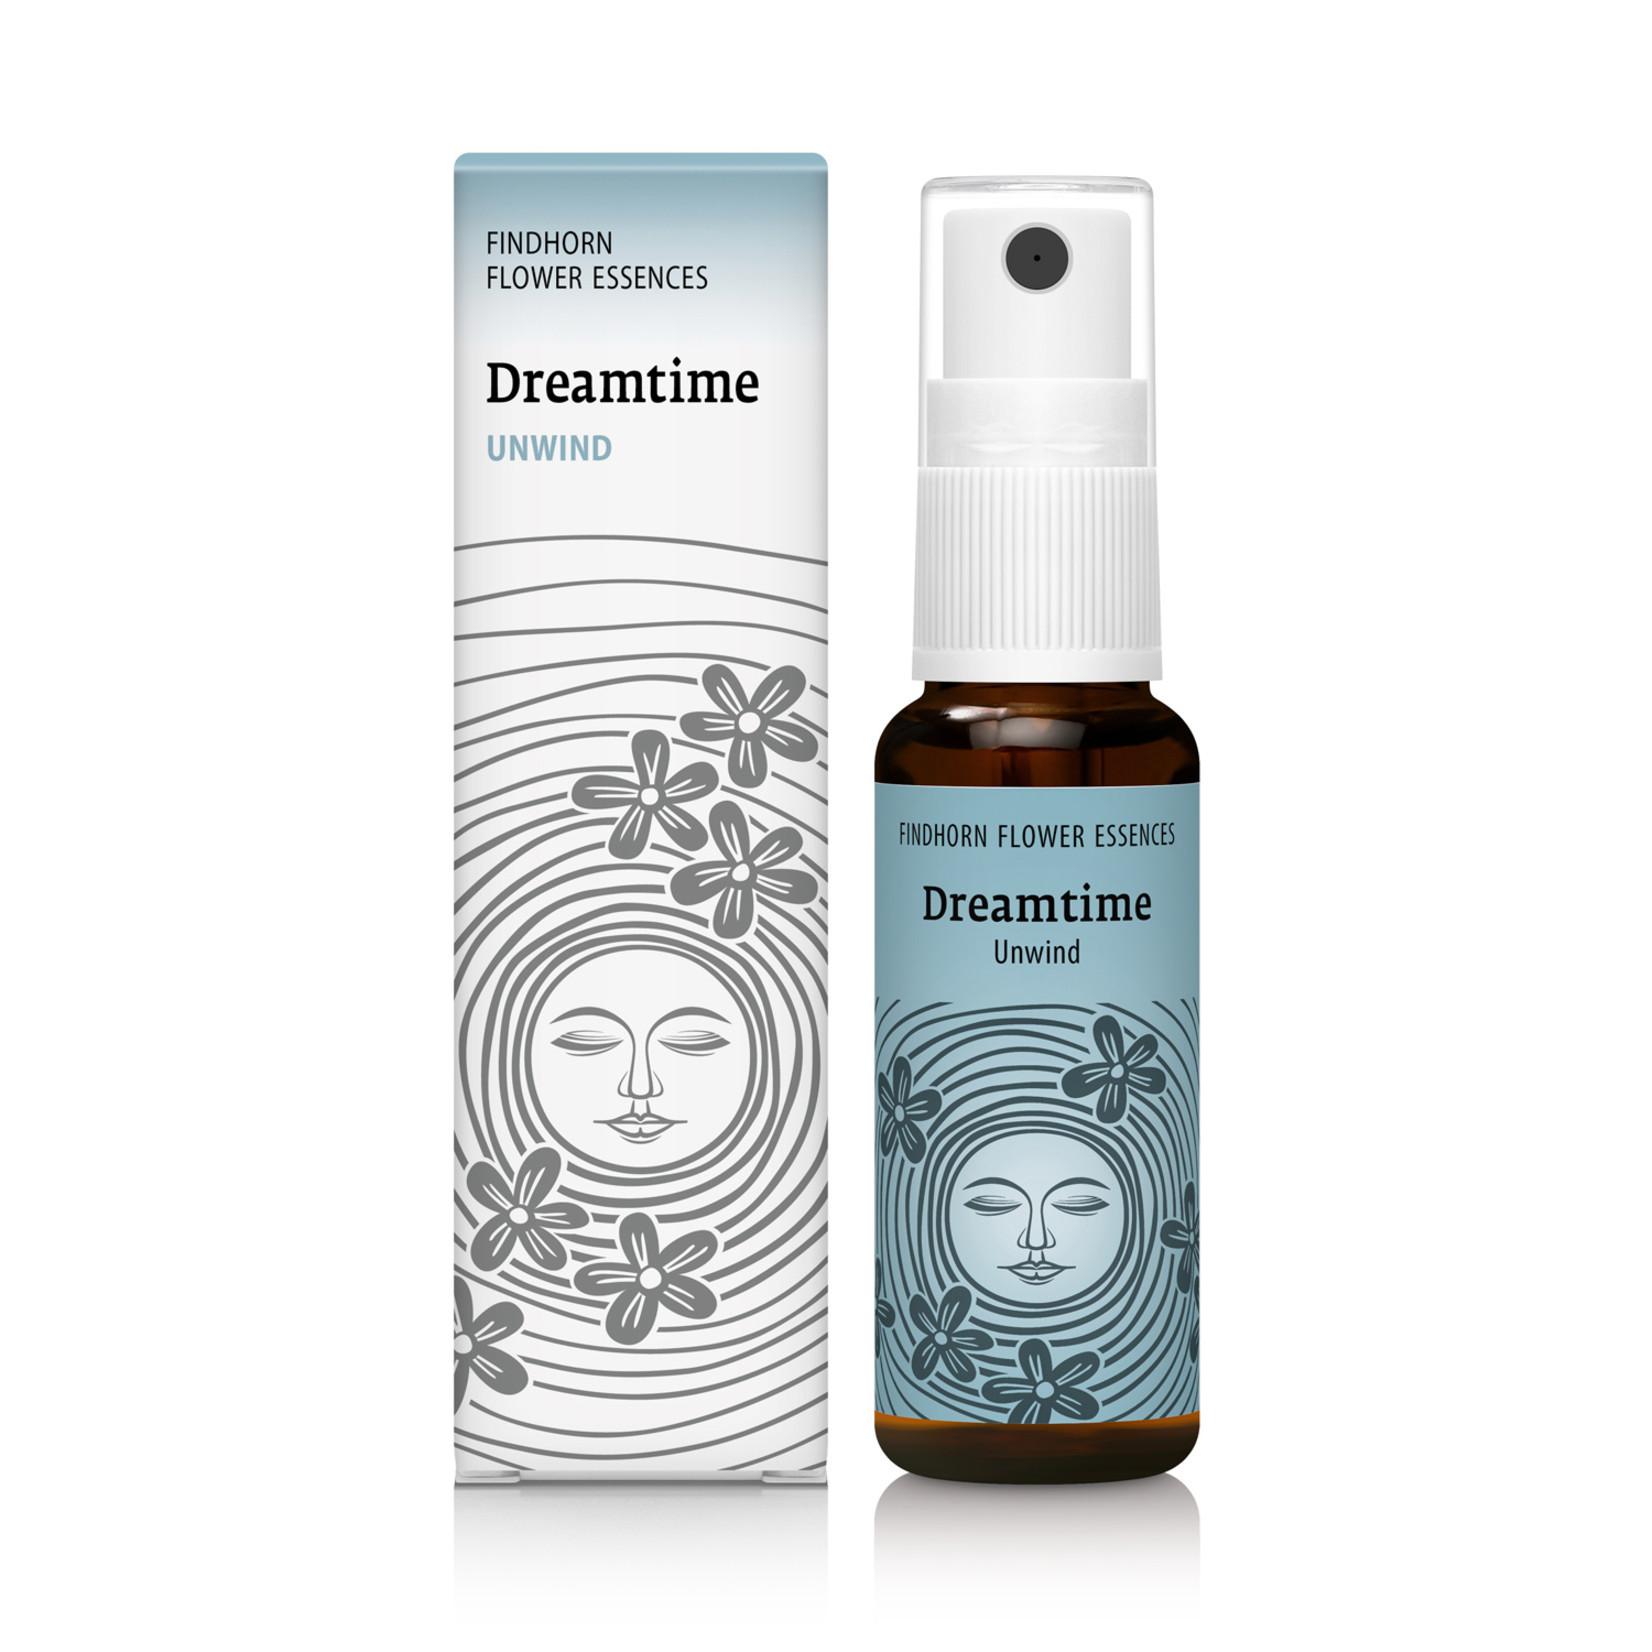 Findhorn Essences Findhorn Essences 'Dreamtime' bloesemspray  - verstoorde slaappatronen